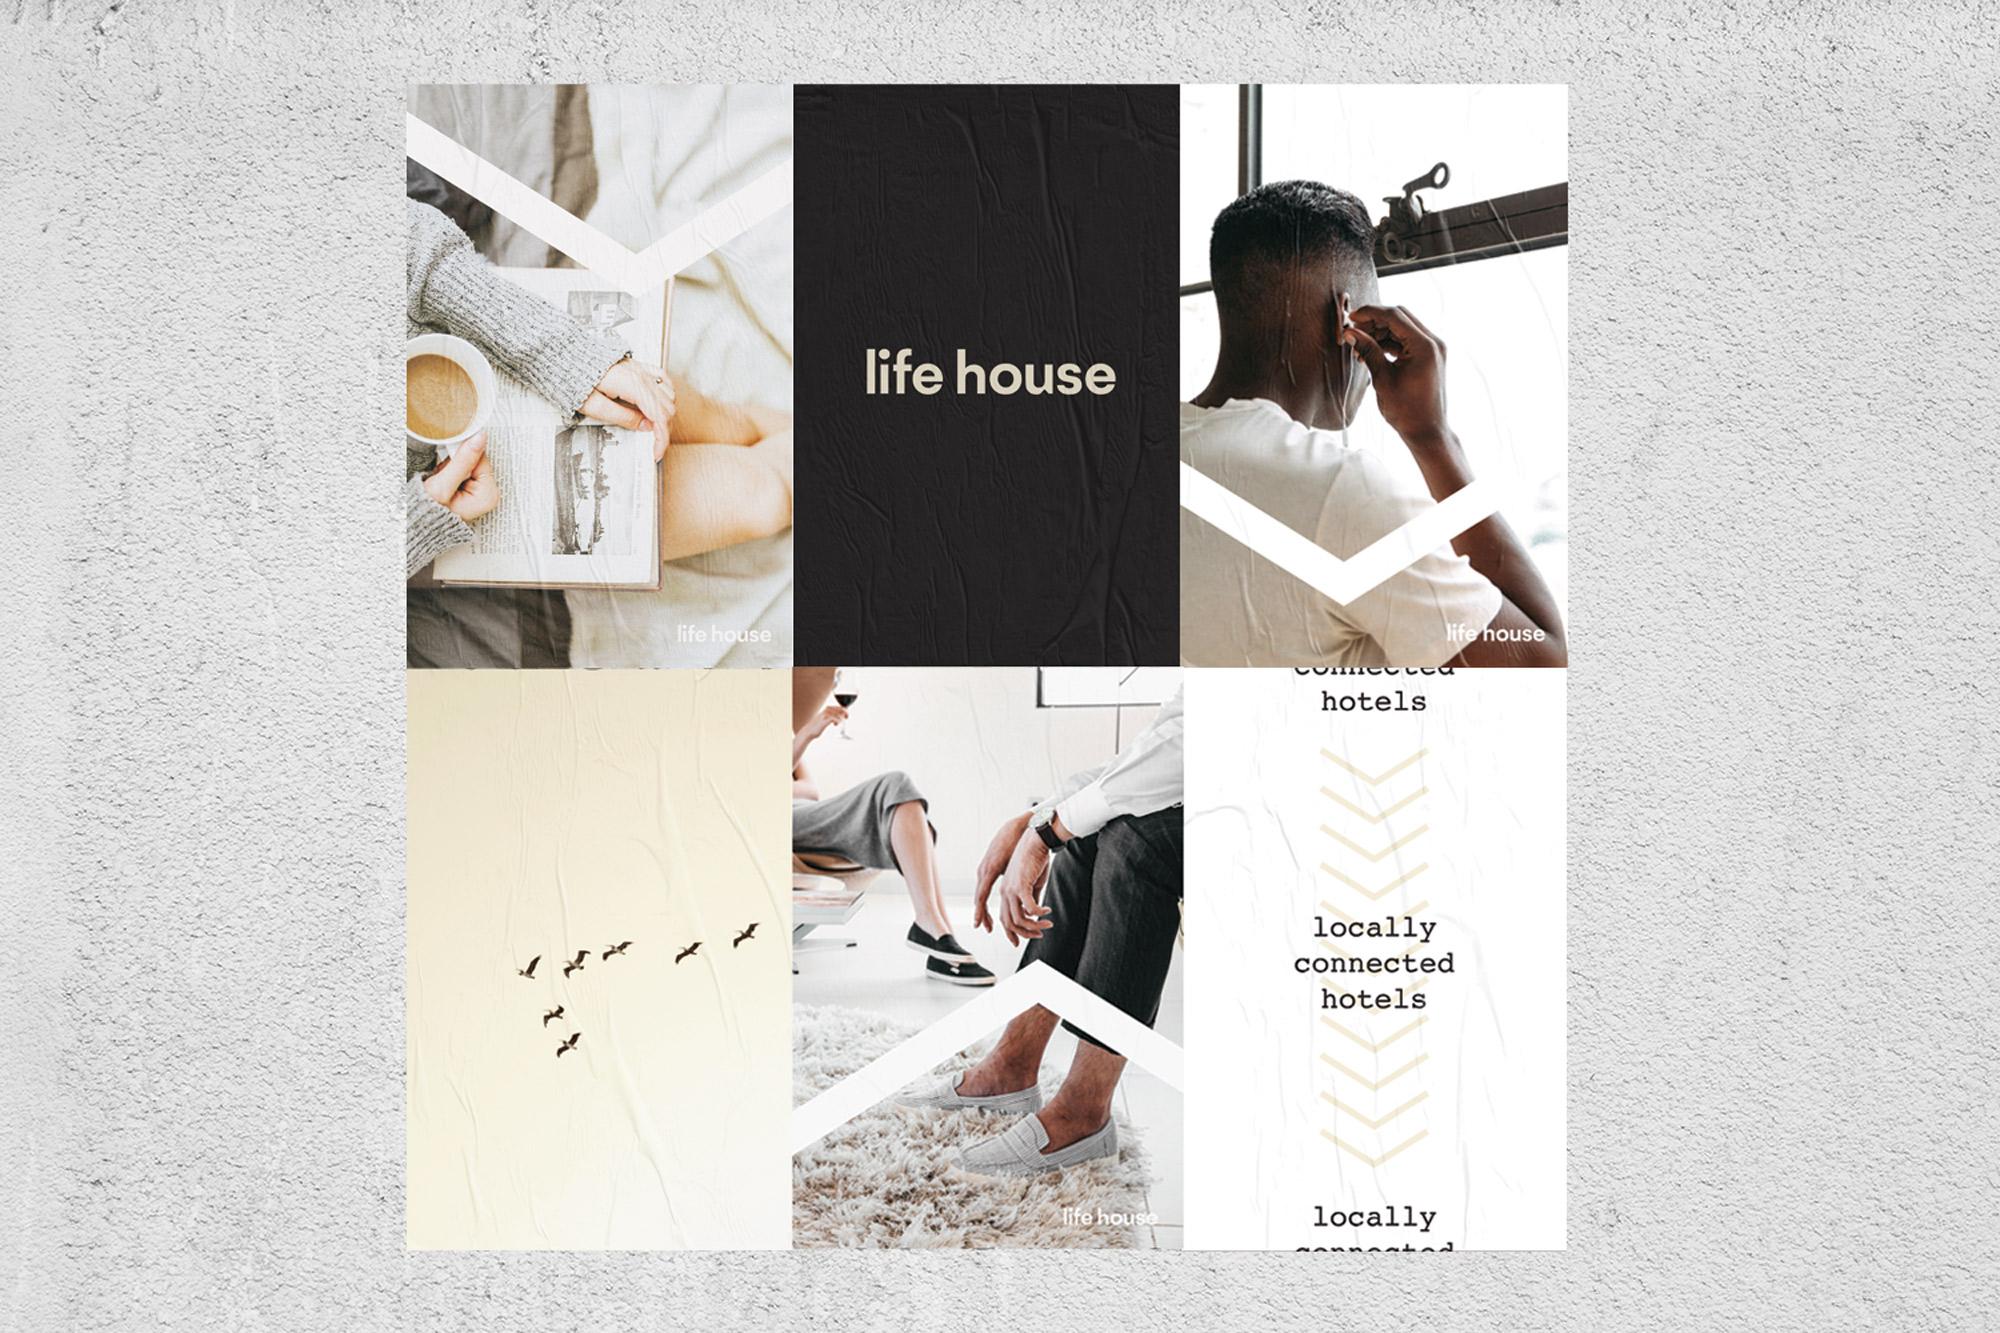 BAD_LifeHouse2